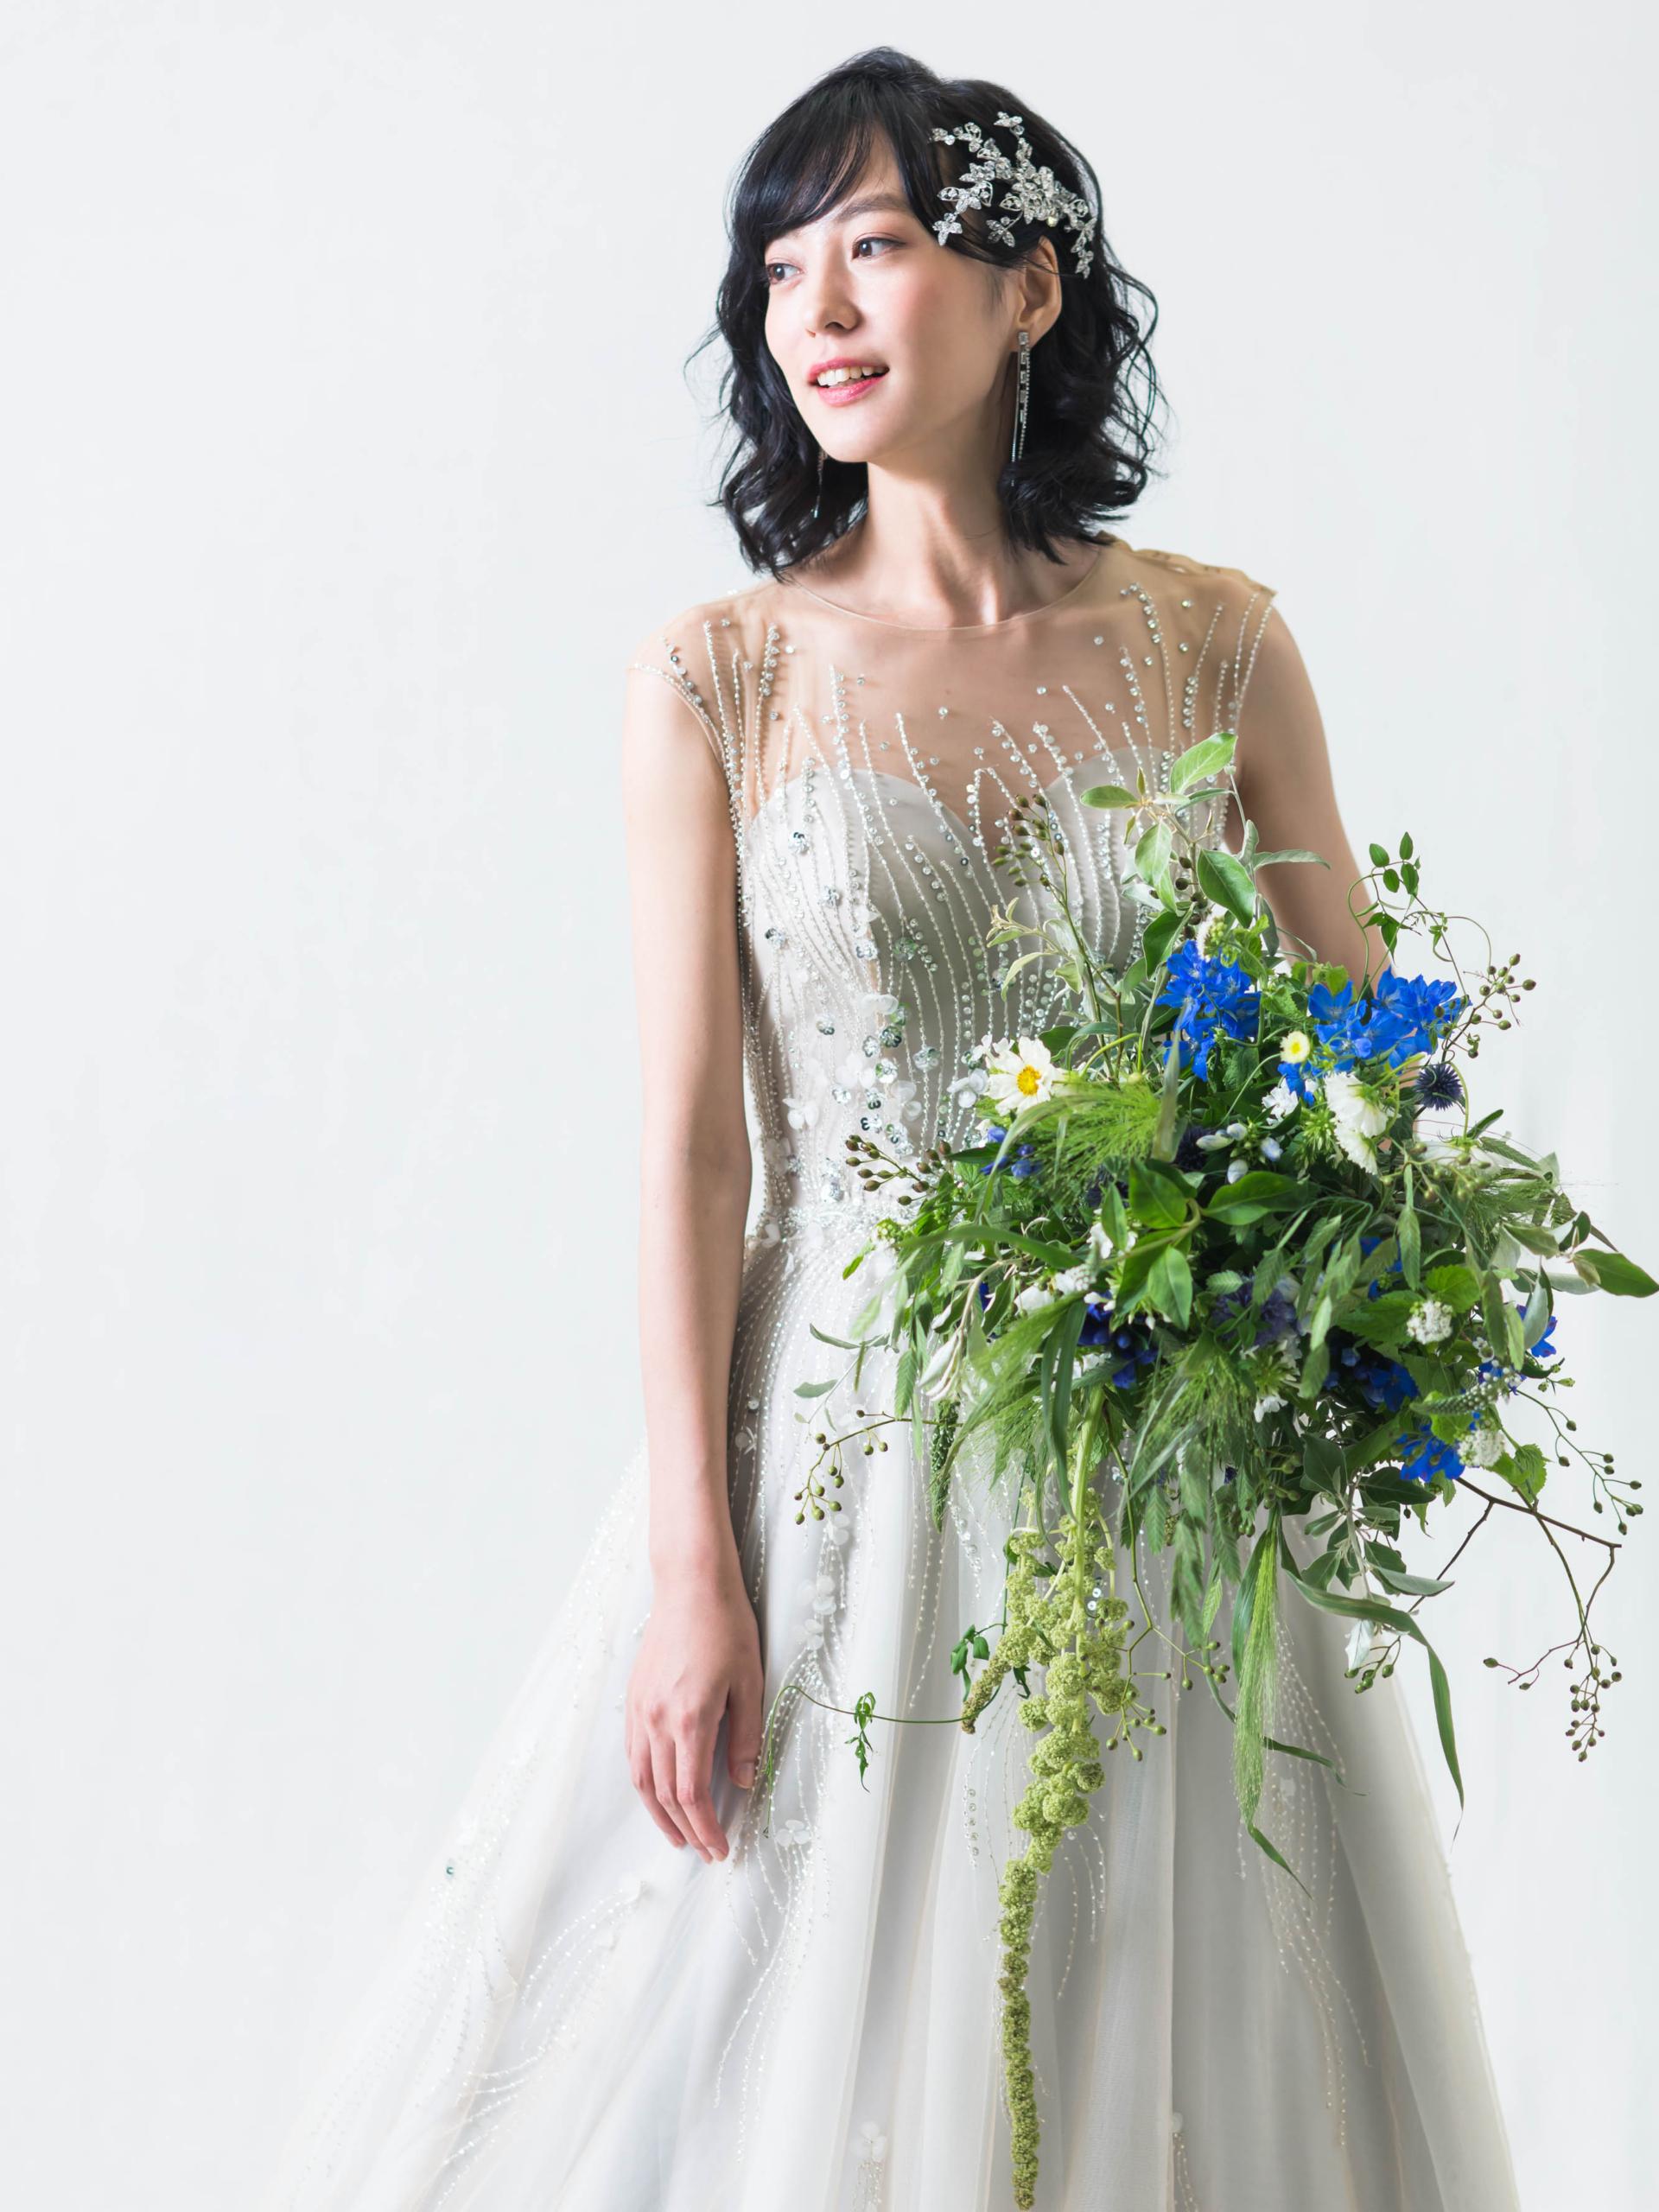 Summer bridal bouquet 夏のウェディングブーケ